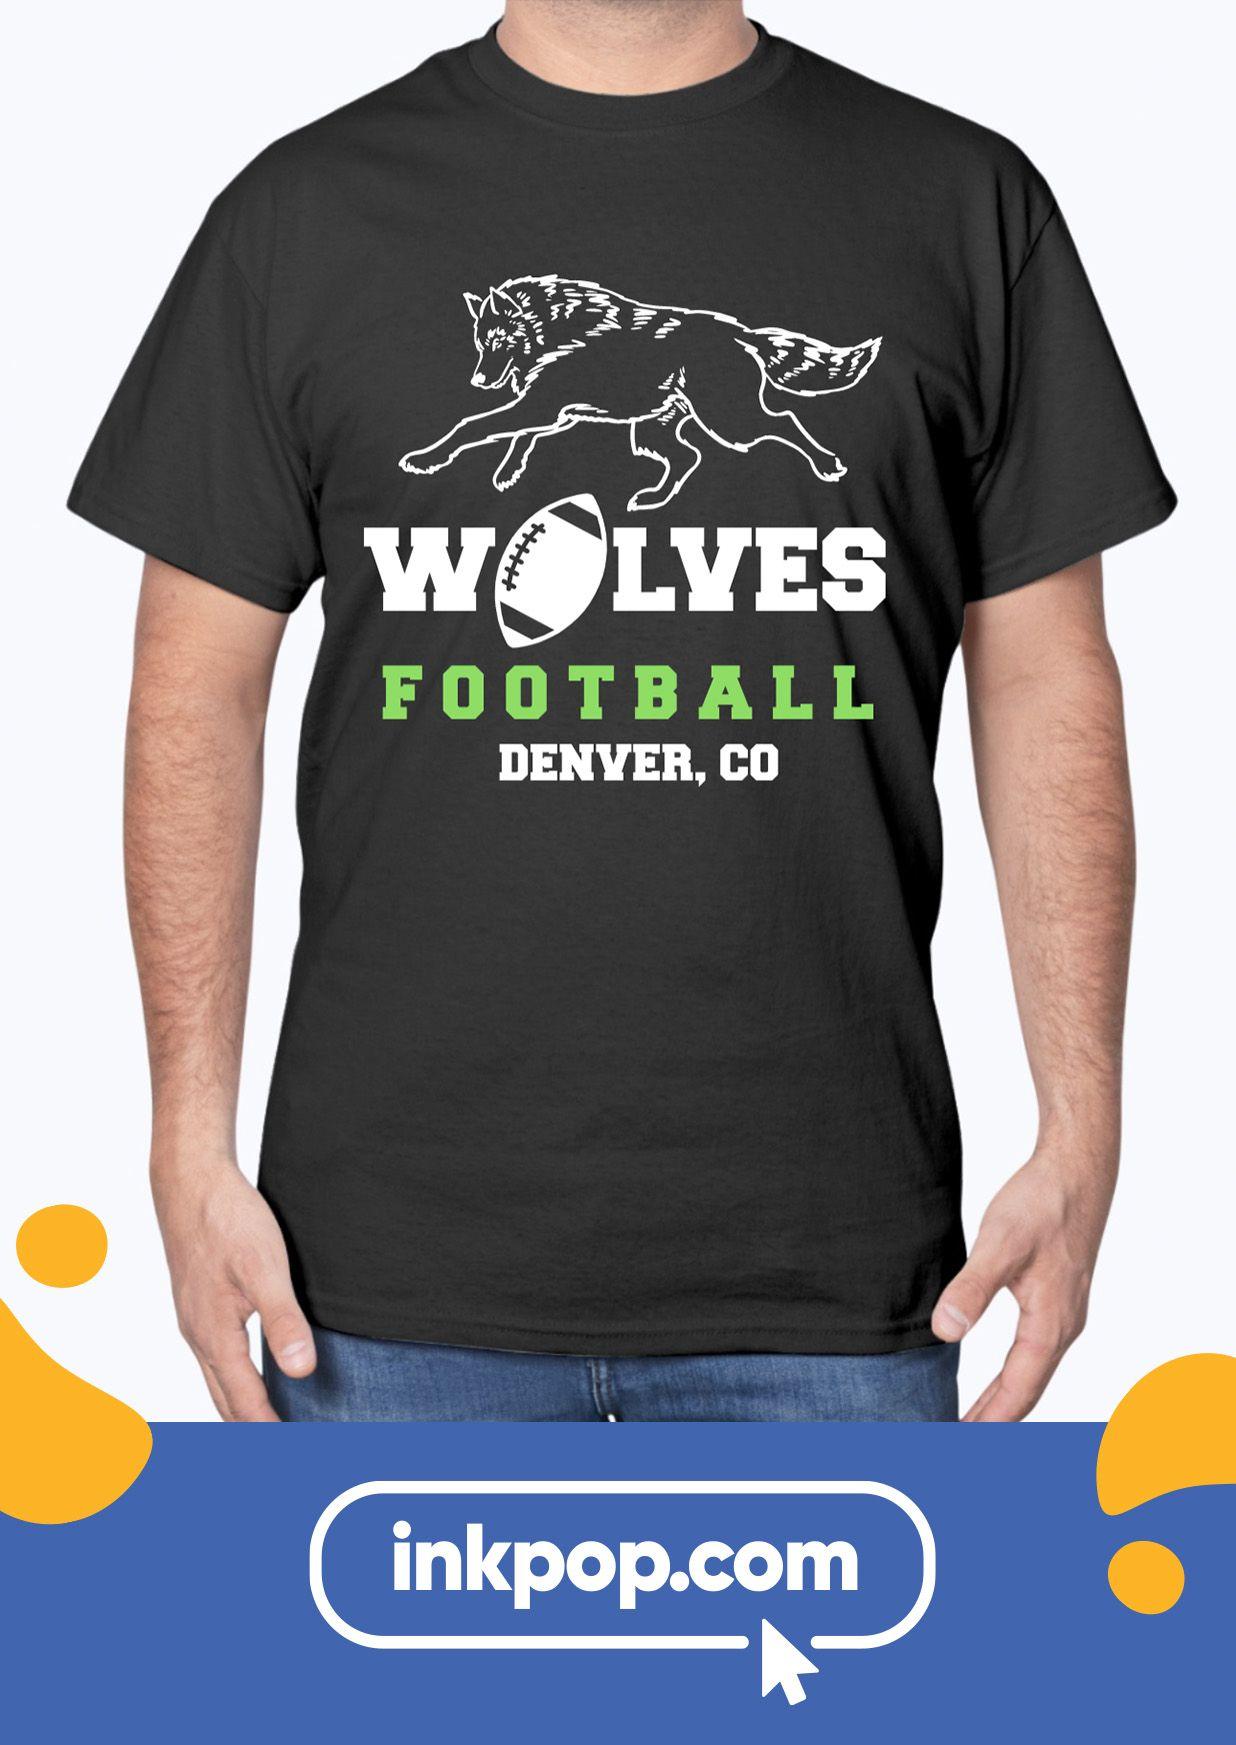 Design your football tshirt short sleeve shirt